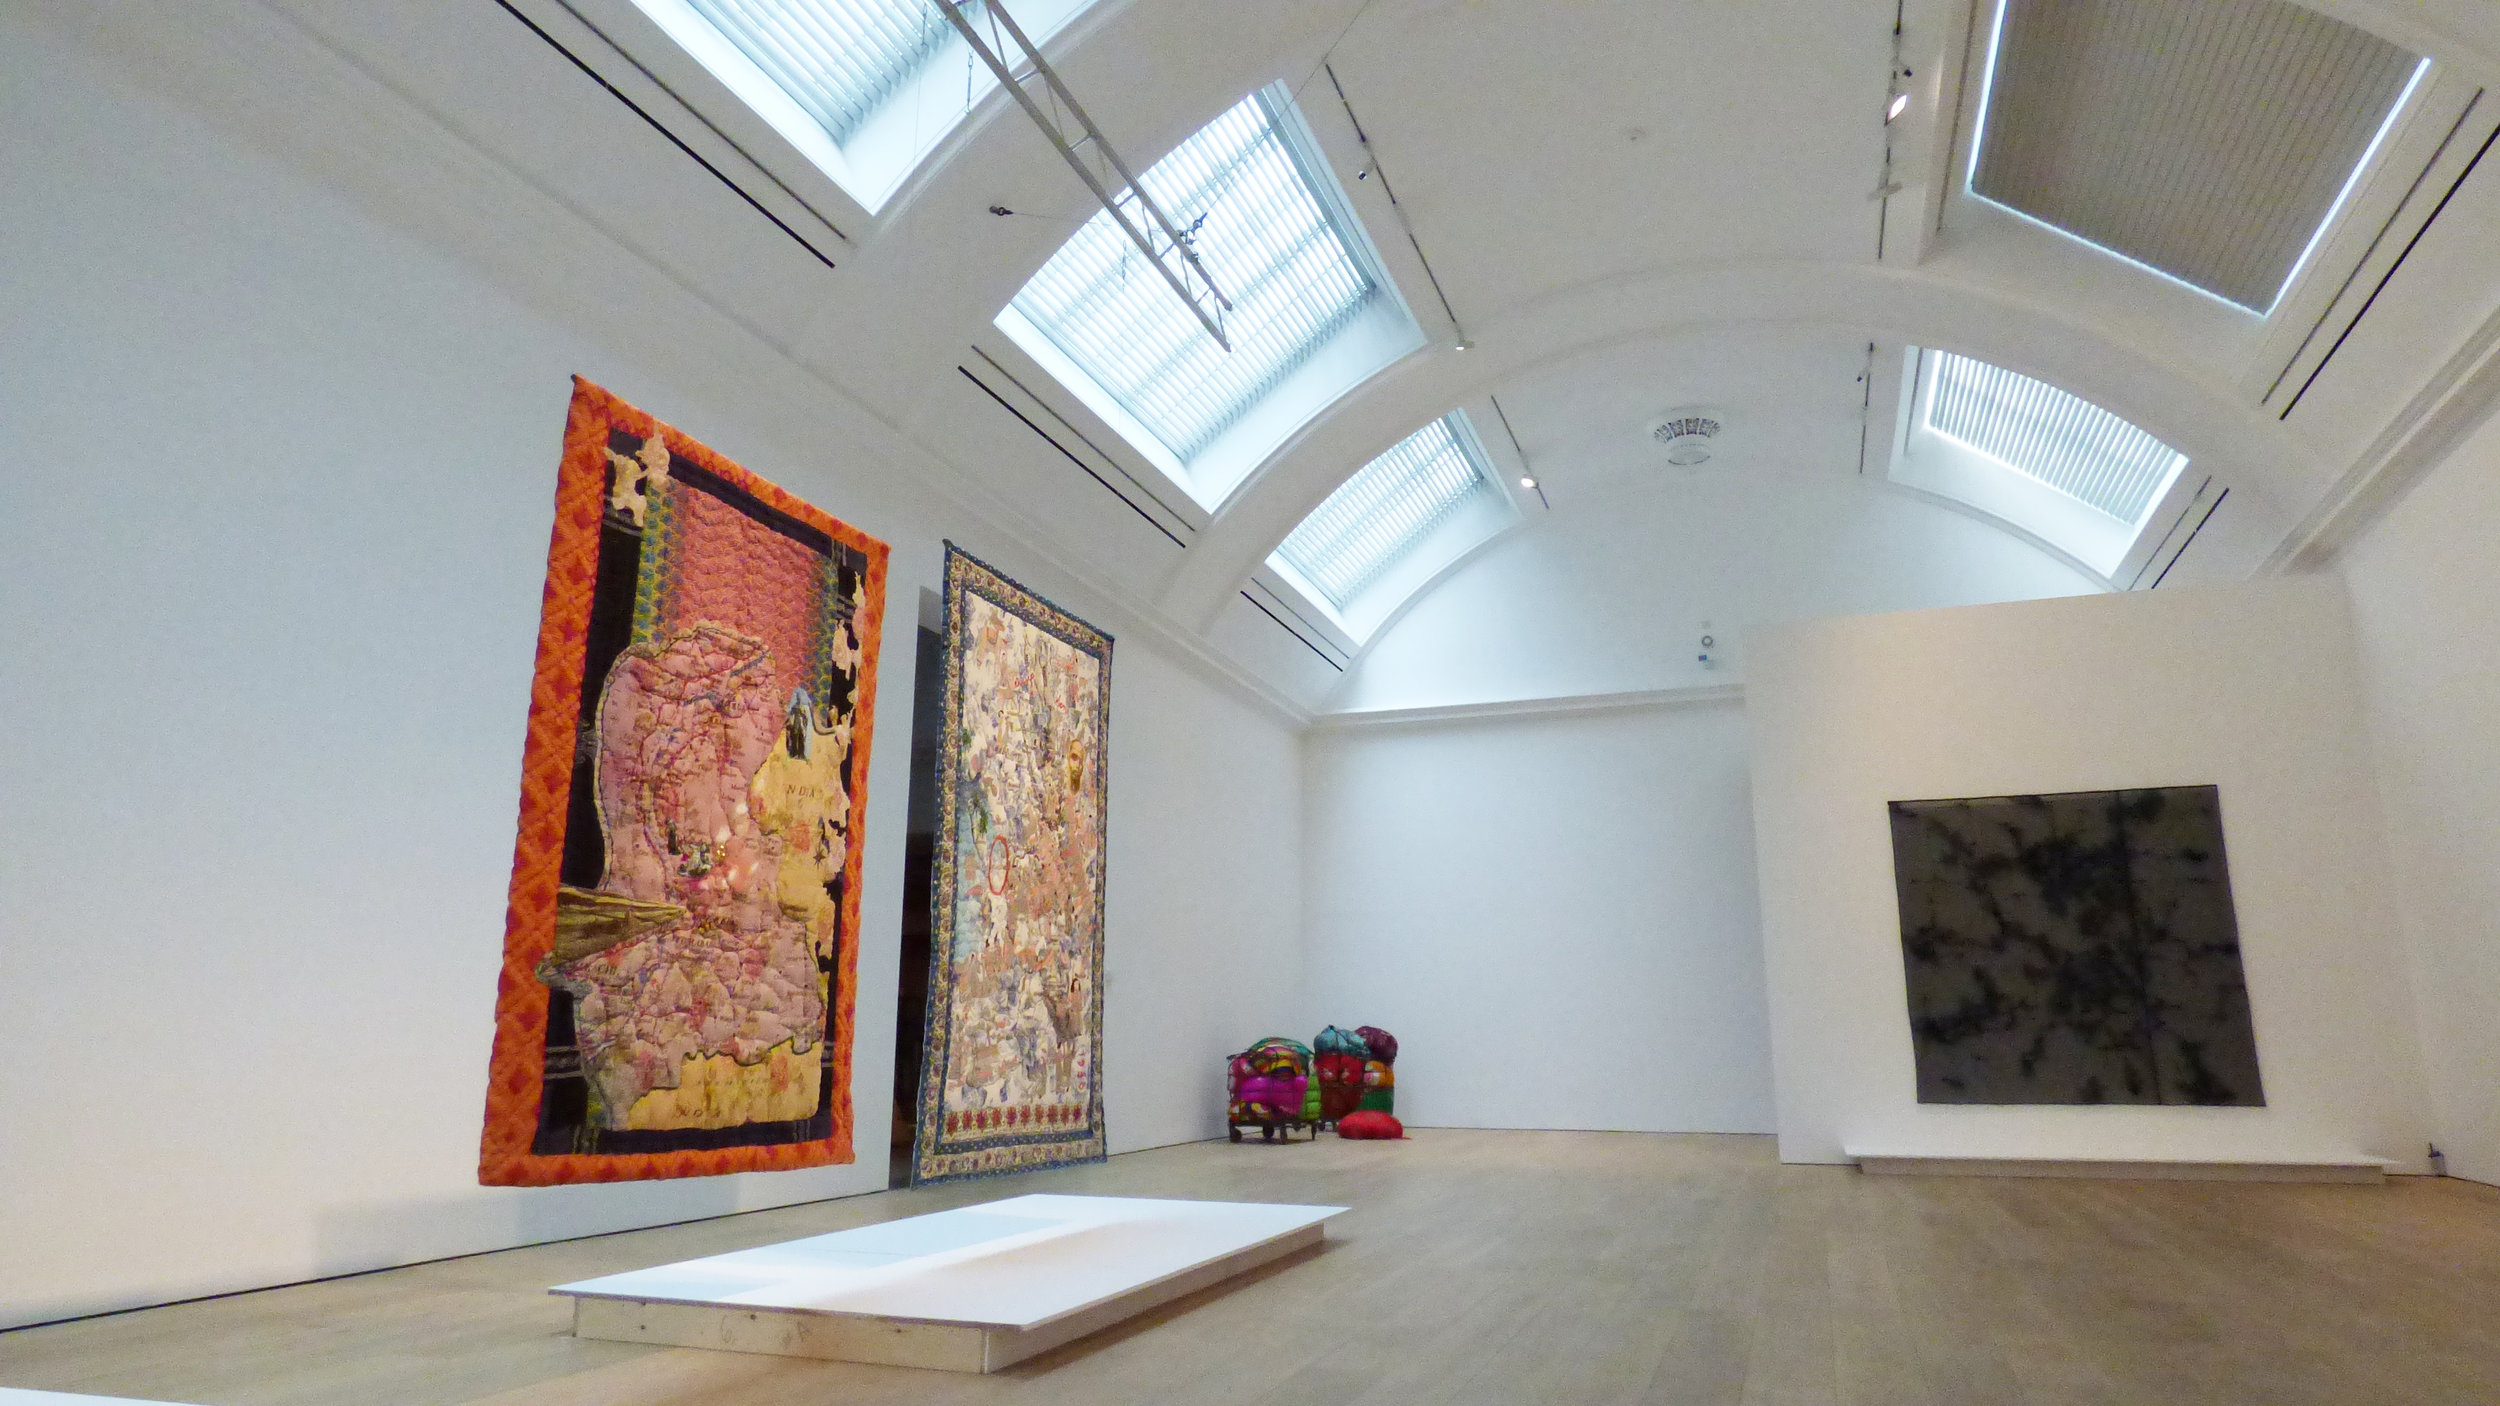 Whitworth Art Gallery Manchester (05).JPG